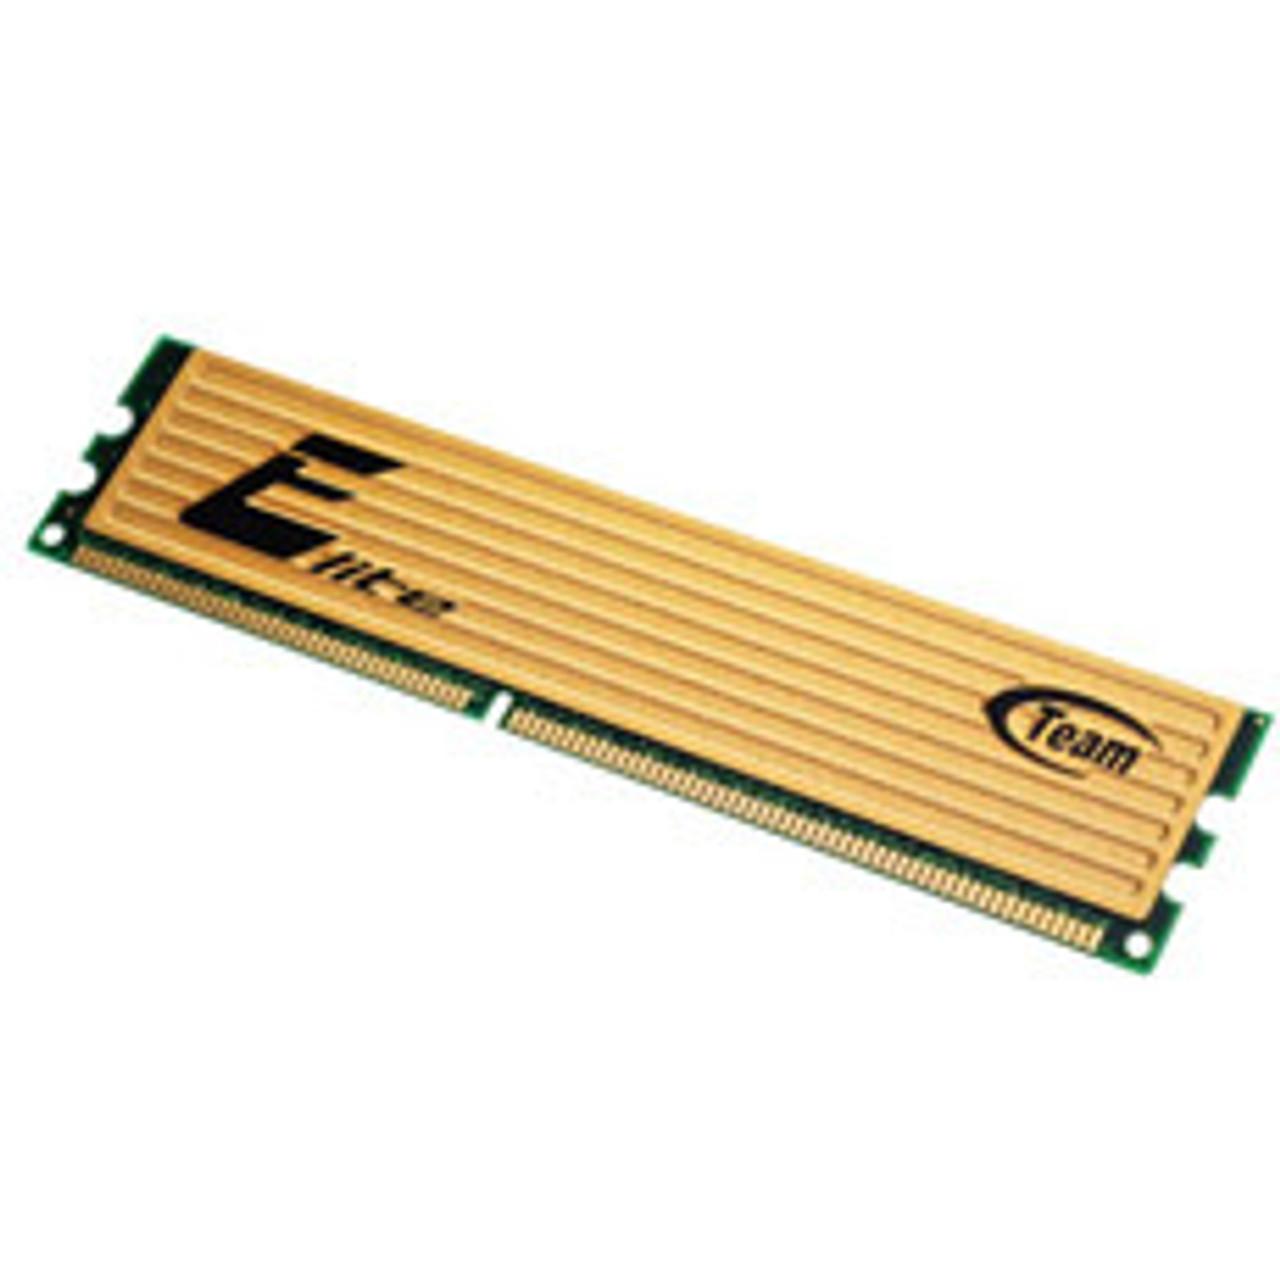 Team 1GB PC-3200 DDR-400MHz Elite (TEDR1024M400HC3)